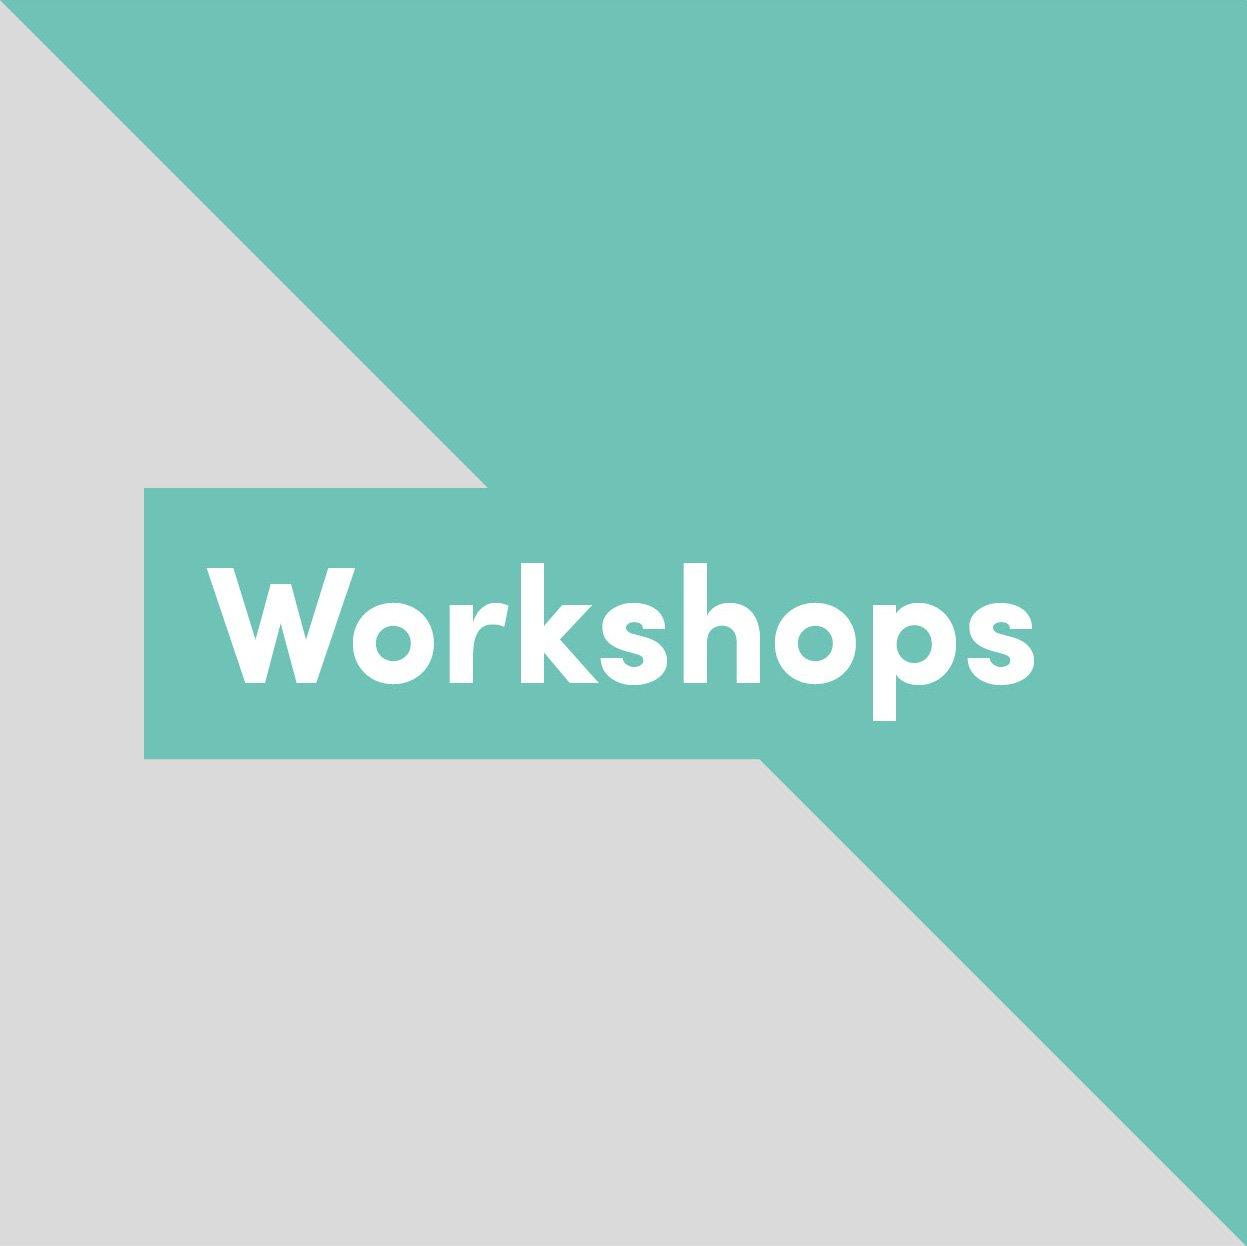 Inspire Makers - Workshops